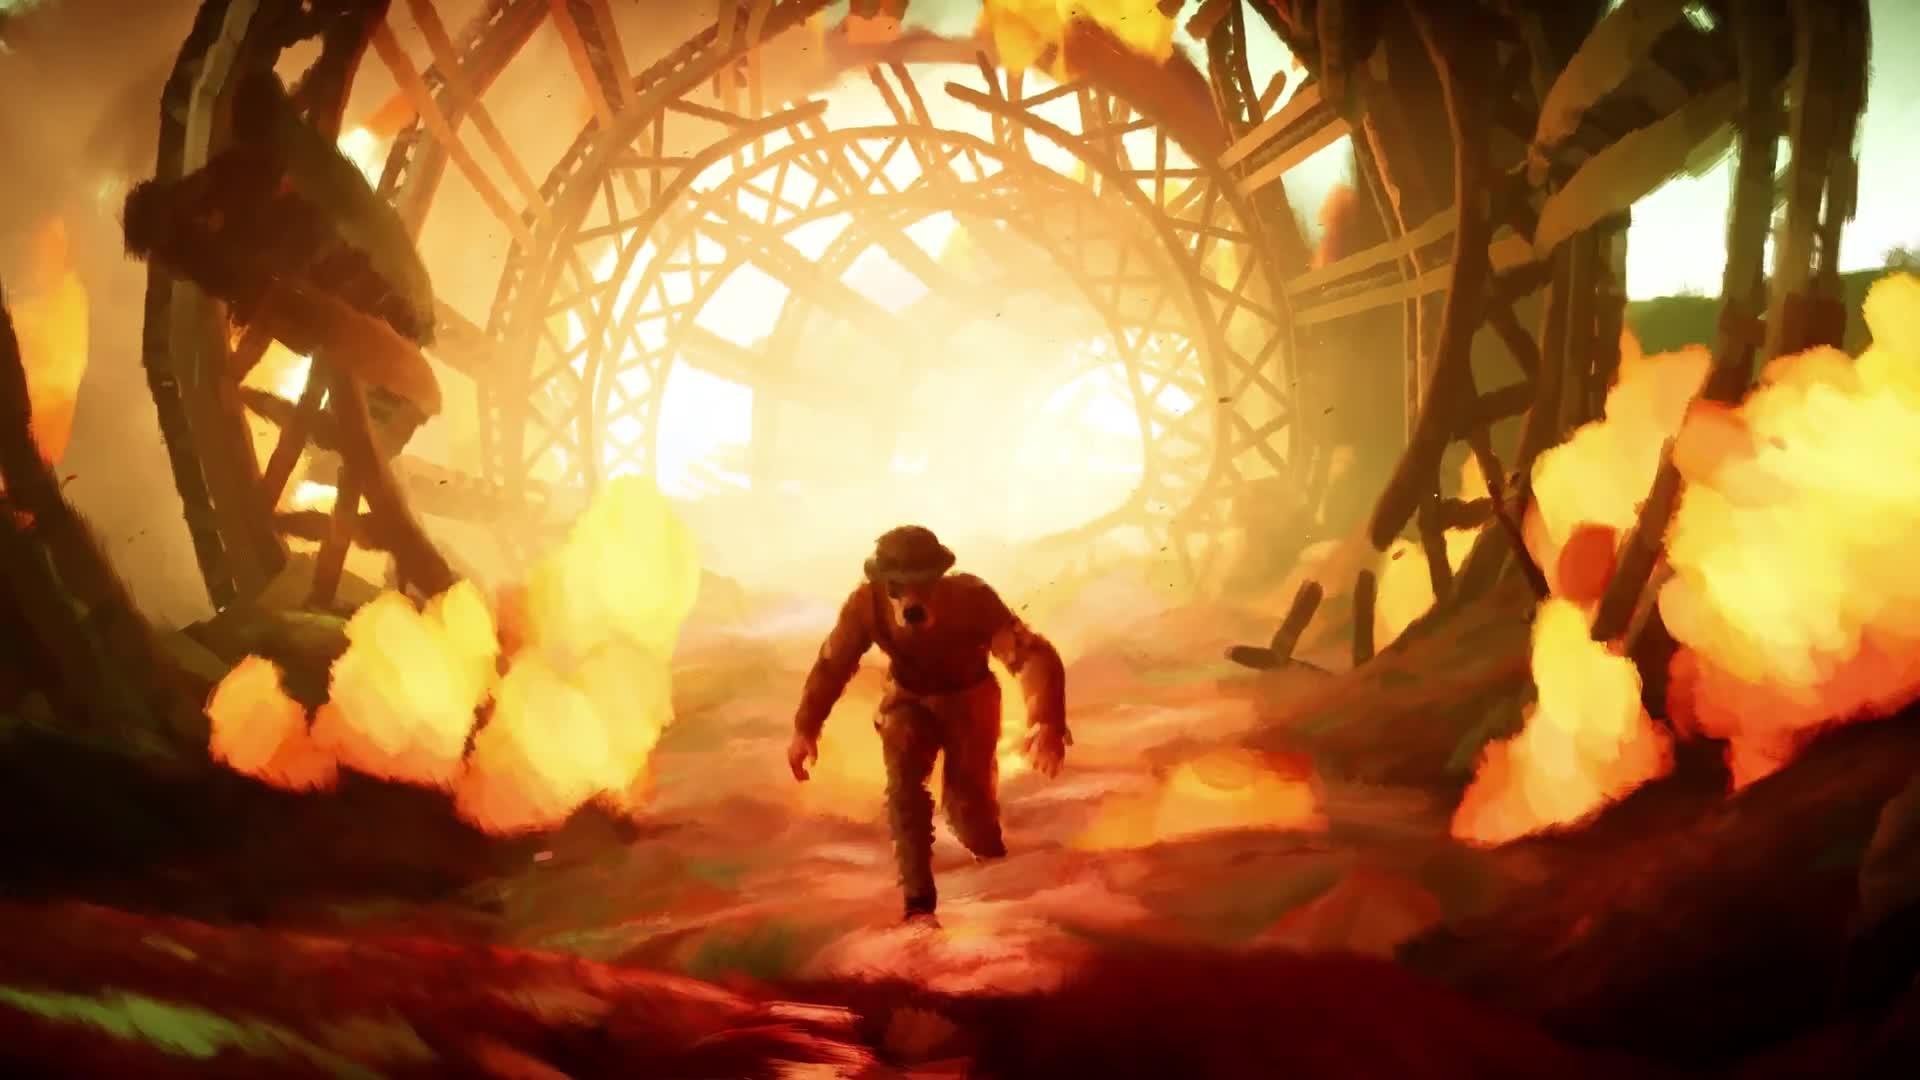 Trailer, Adventure, Bandai Namco, Weltkrieg, Erster Weltkrieg, 11-11: Memories Retold, 11-11, Memories Retold, Aardman Animations, Digixart